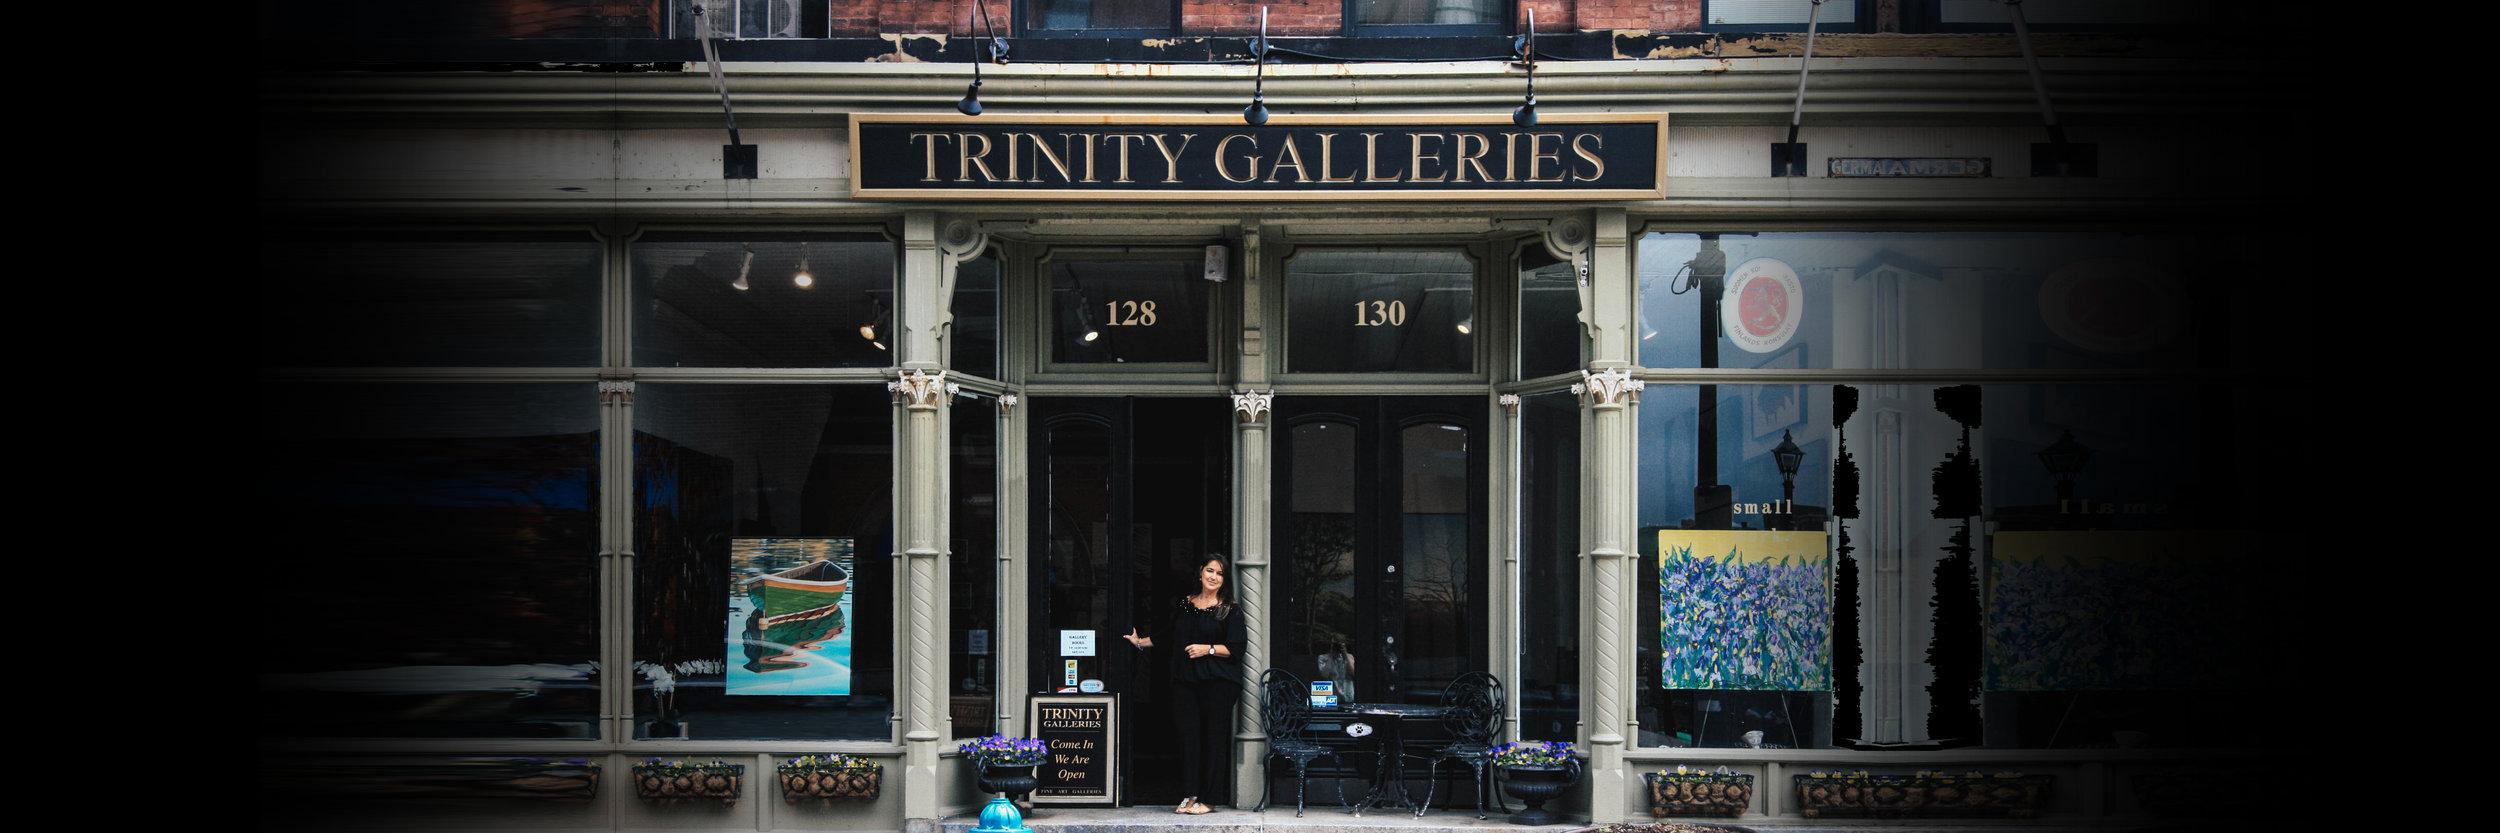 Trinity-43ed.jpg